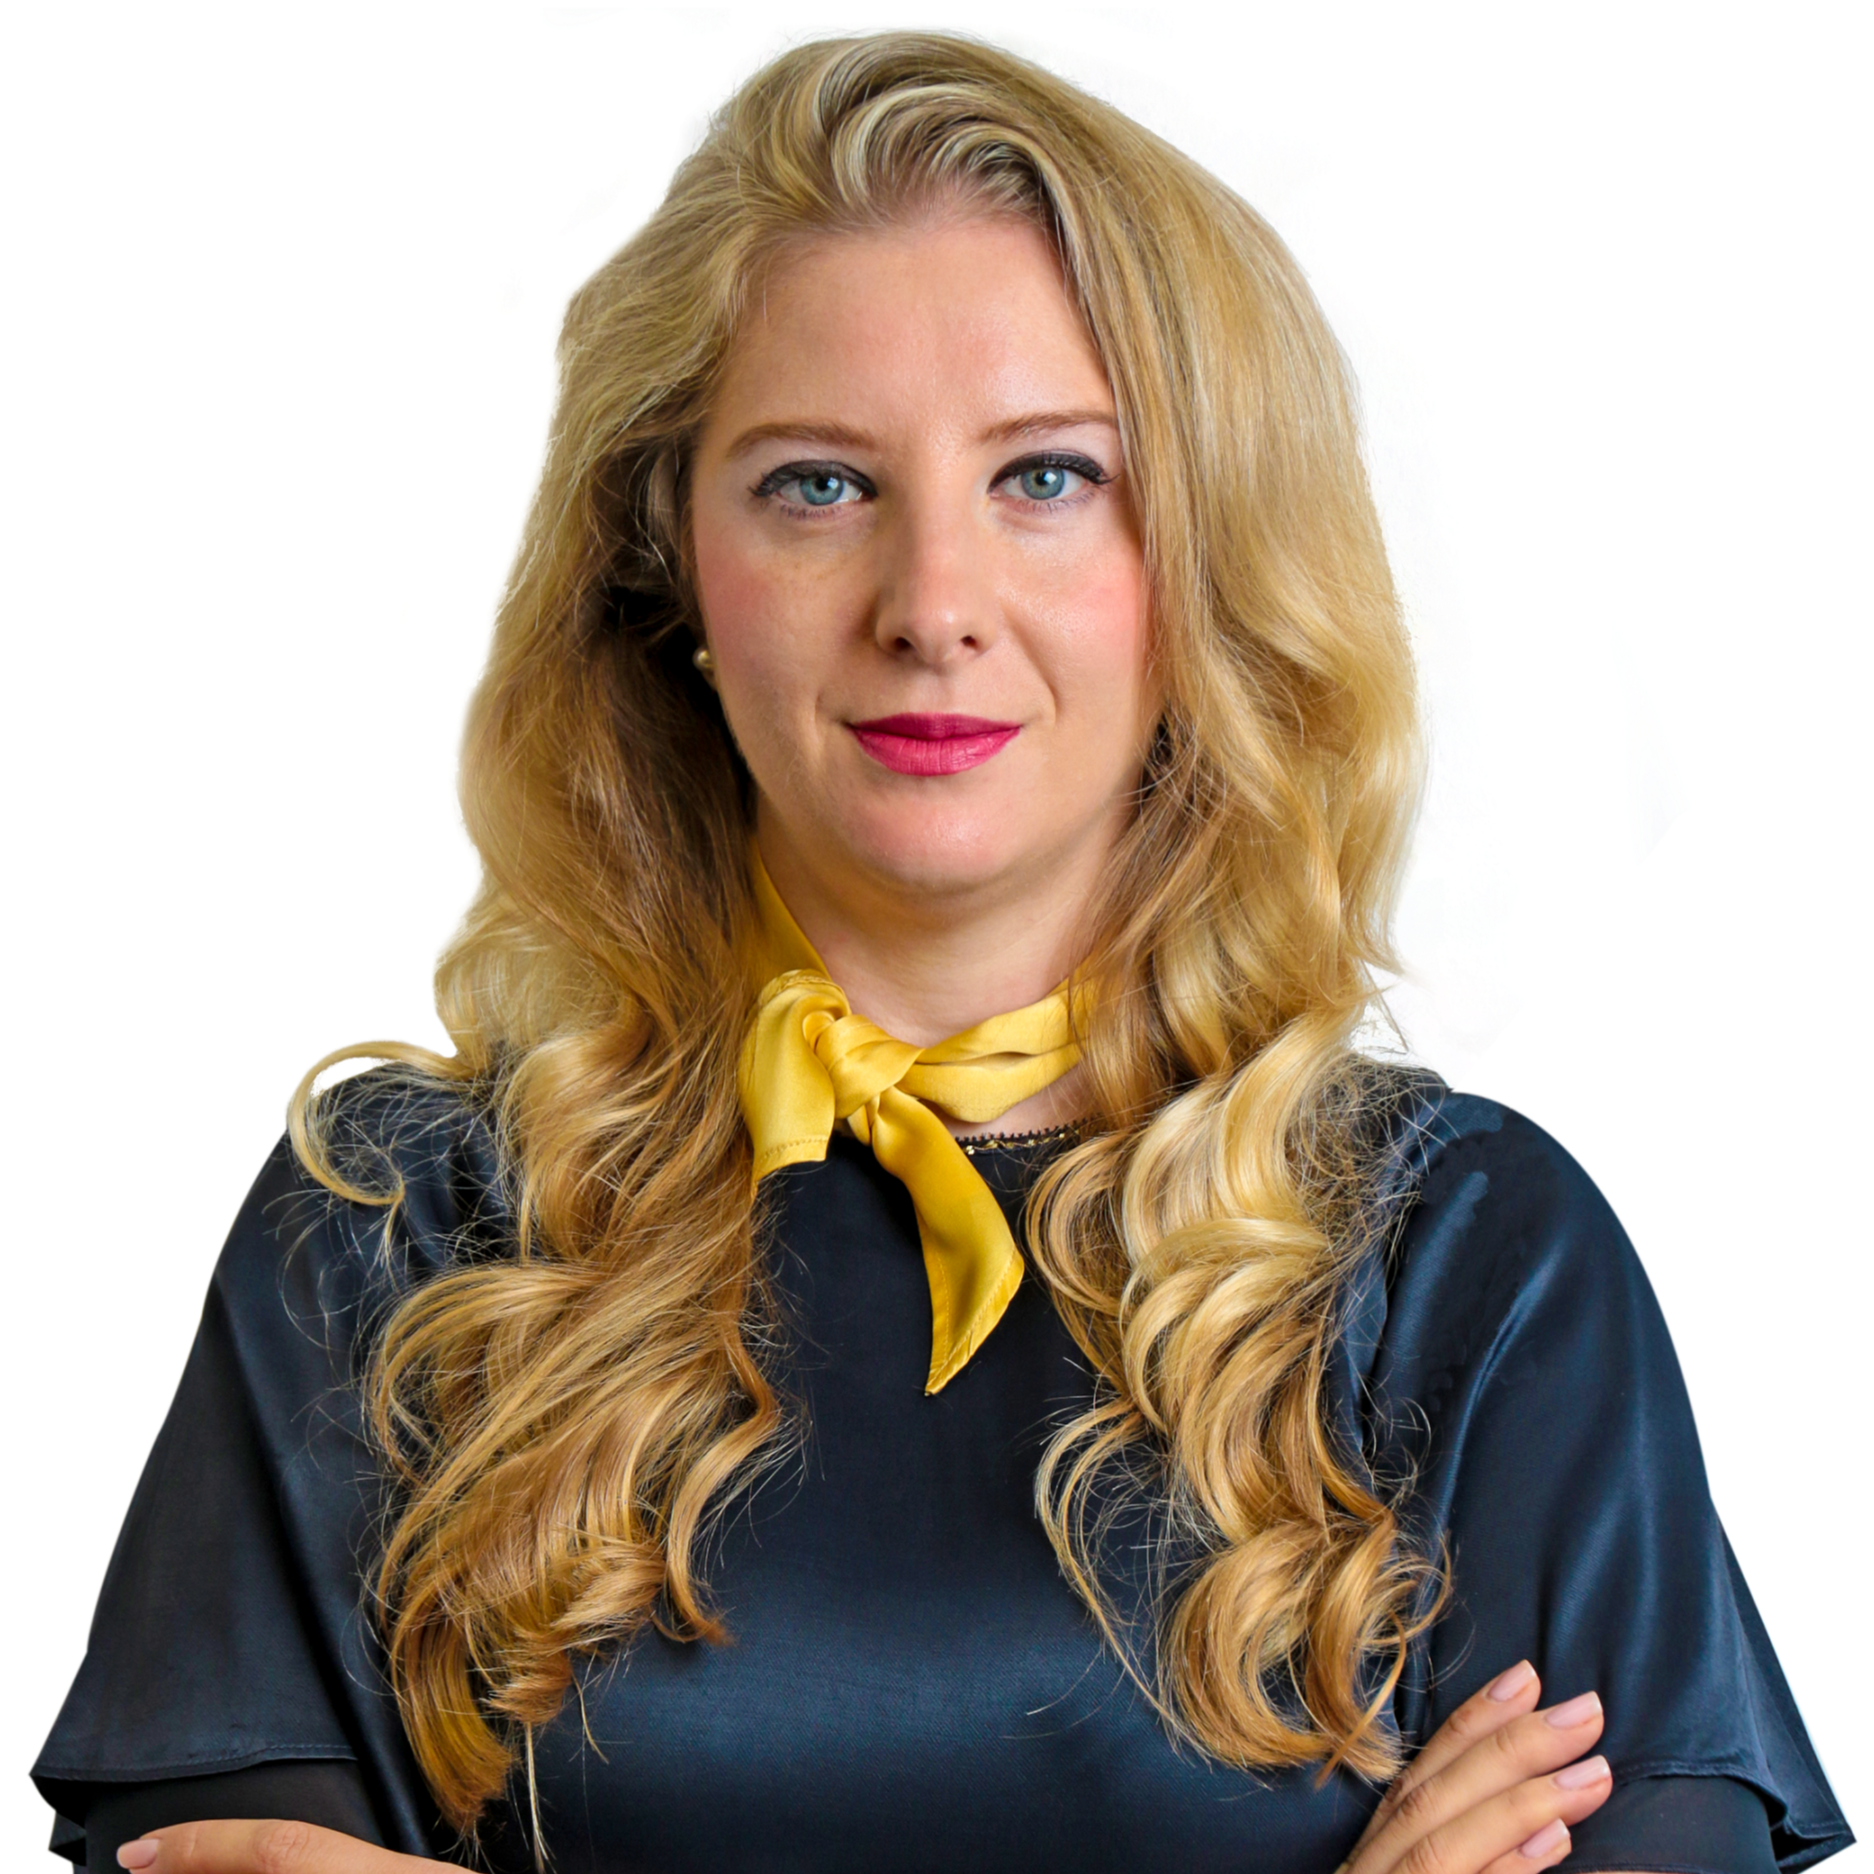 Olga Kapitannikova